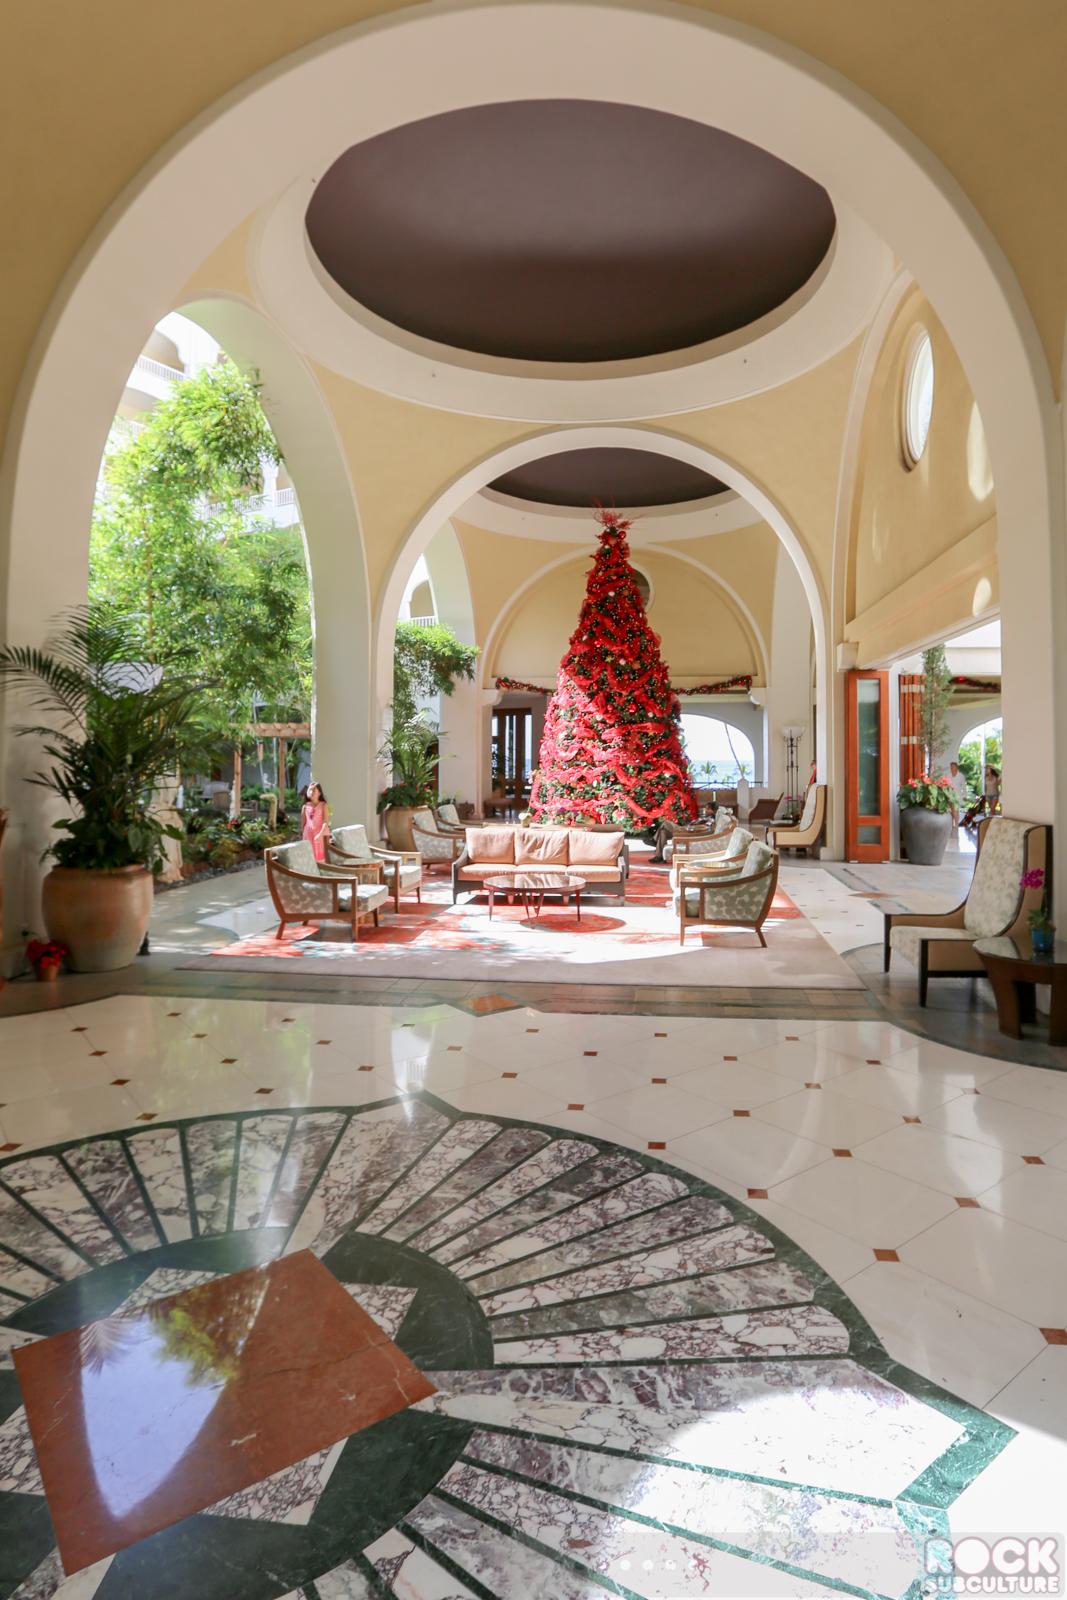 Hotel resort review the fairmont kea lani maui hawaii for Design hotel hawaii